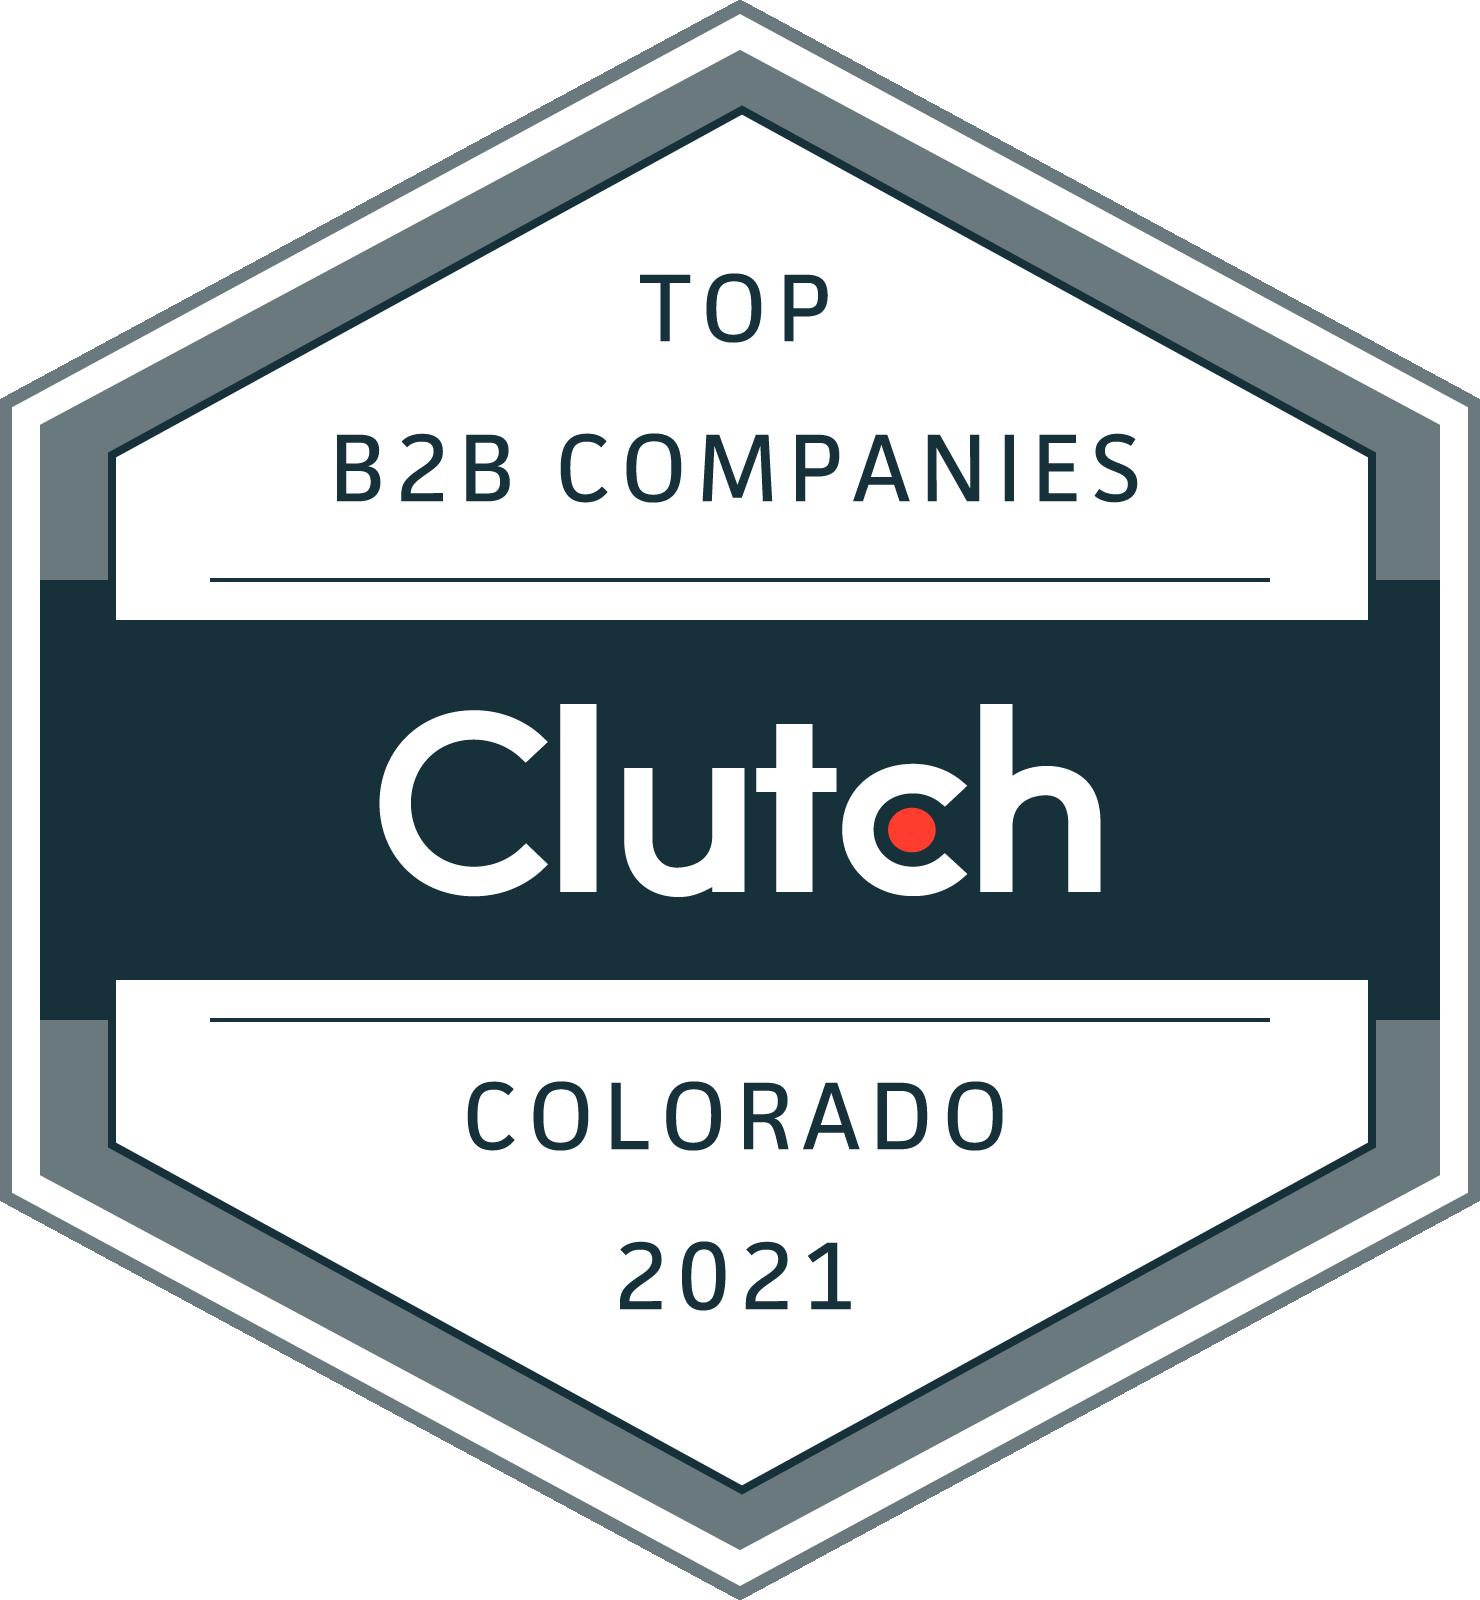 Clutch Top B2B Company 3 Years Running